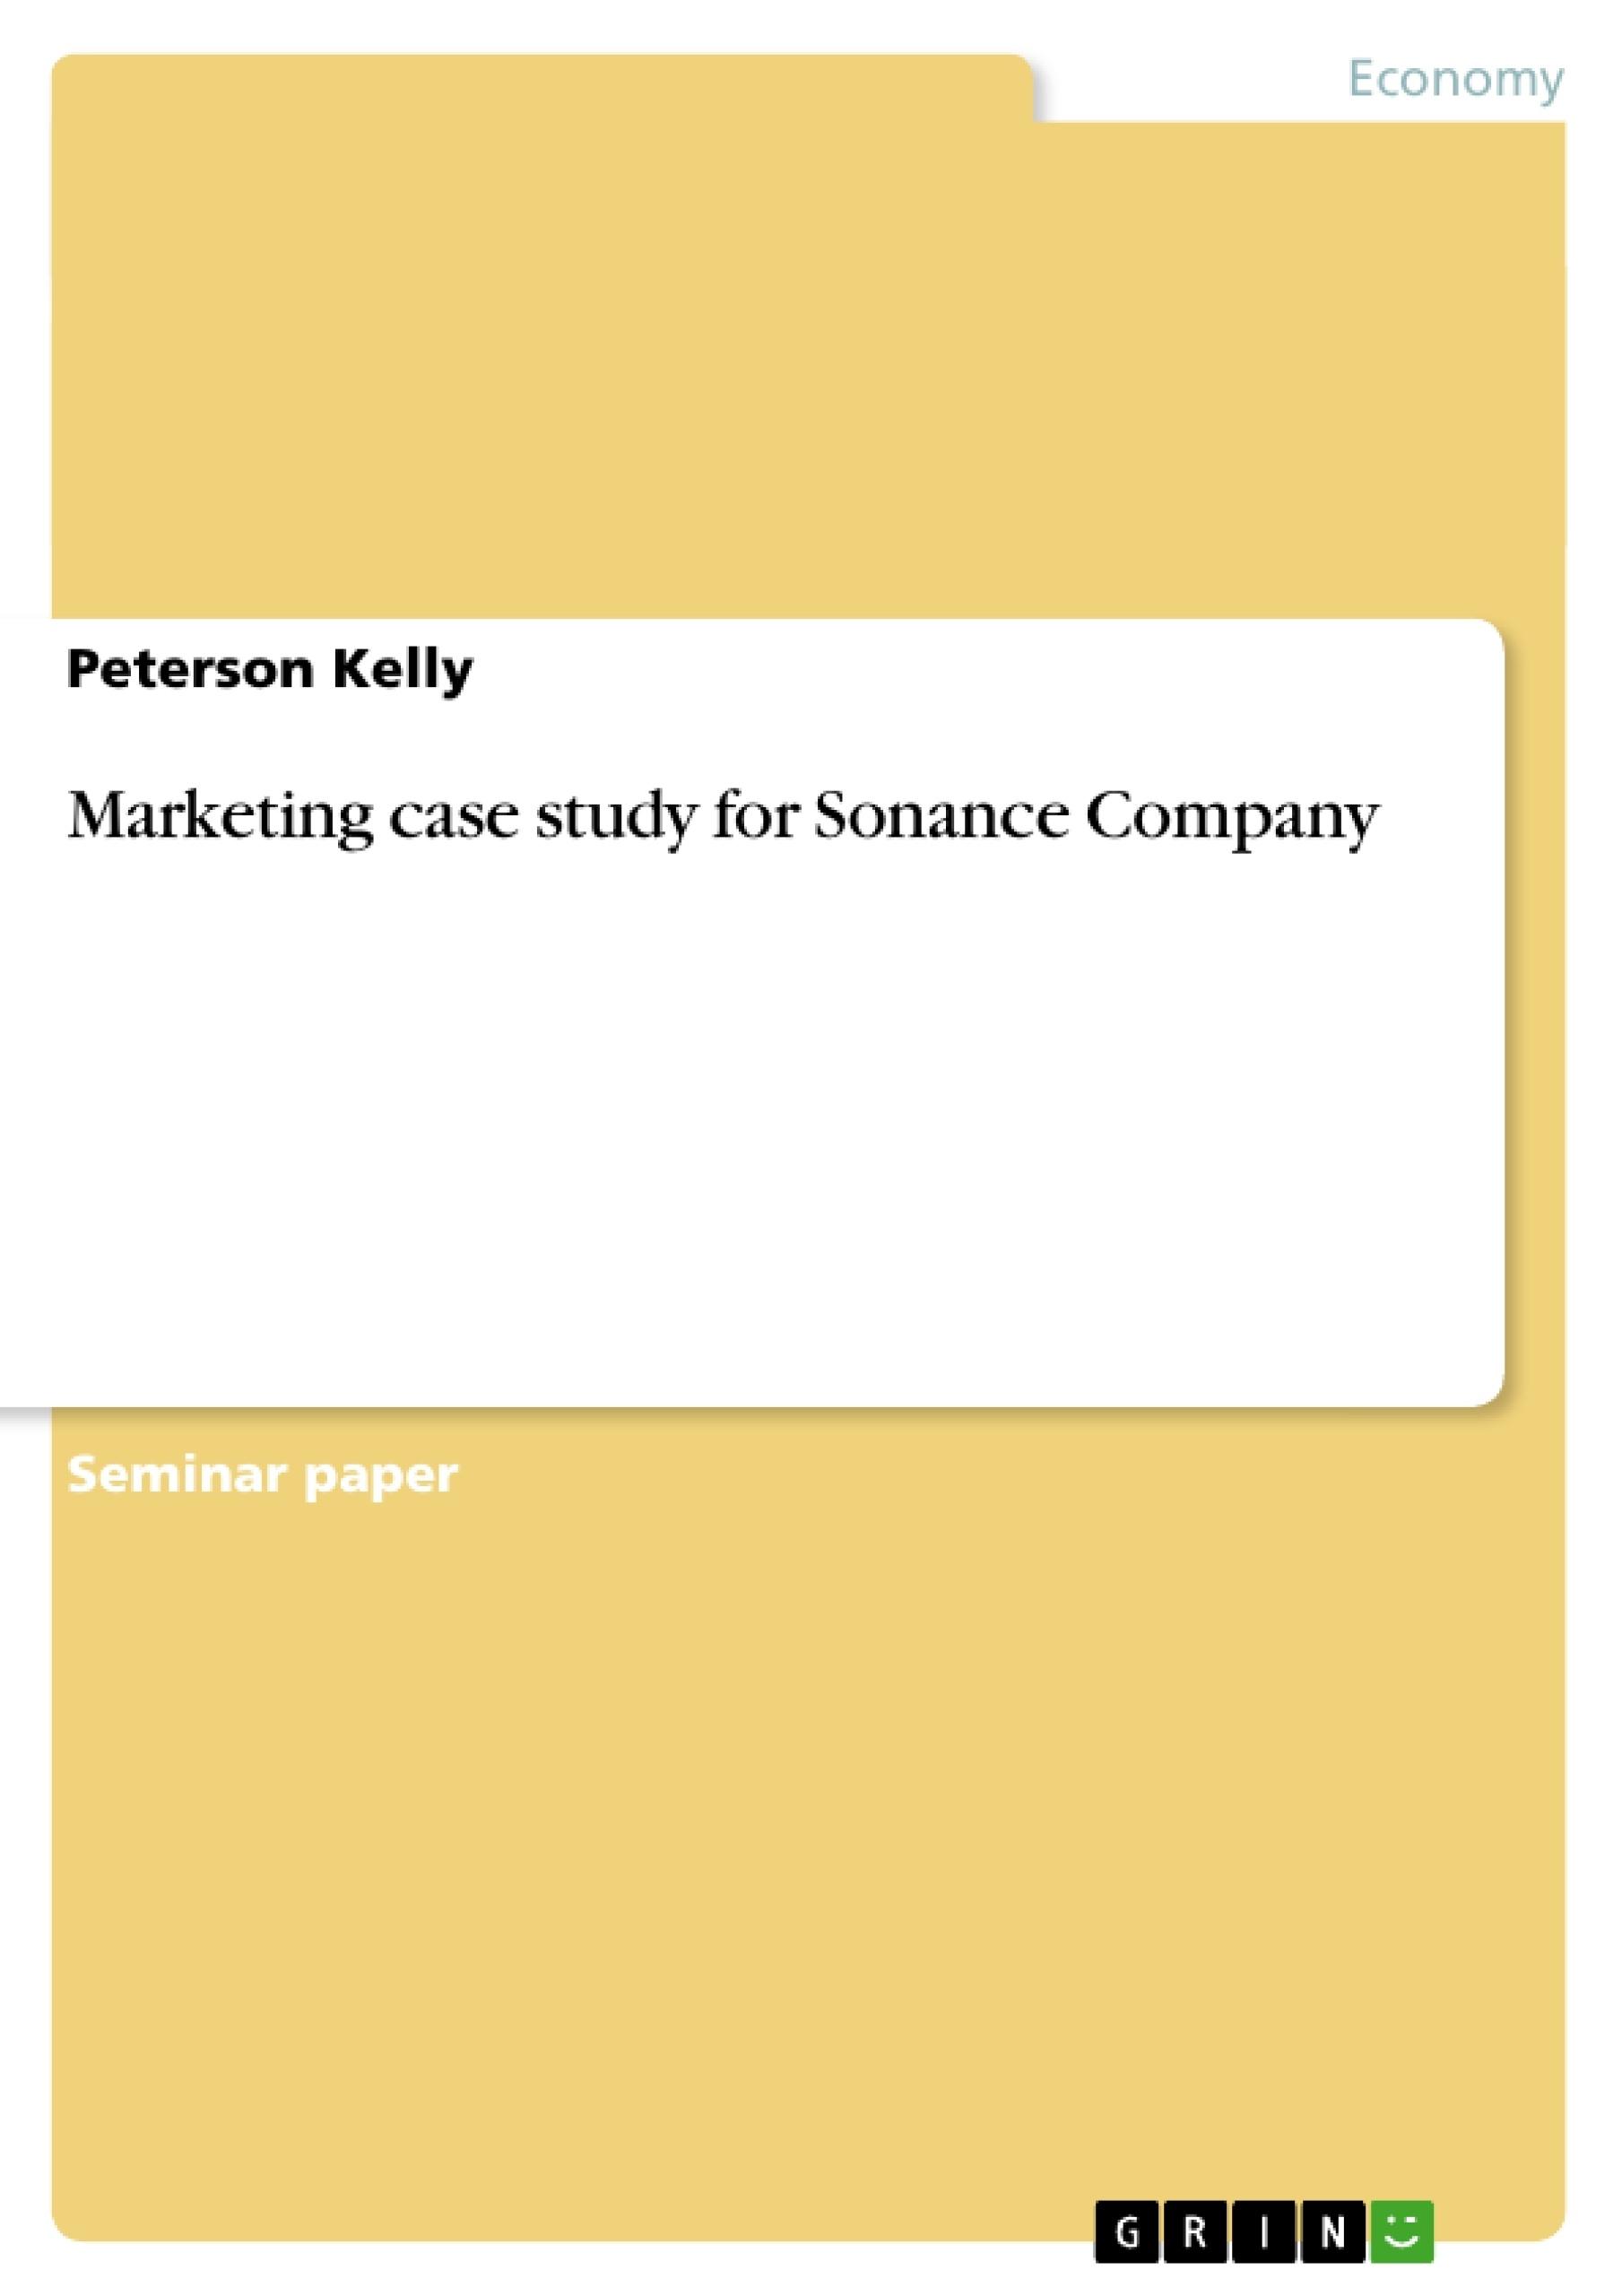 Title: Marketing case study for Sonance Company